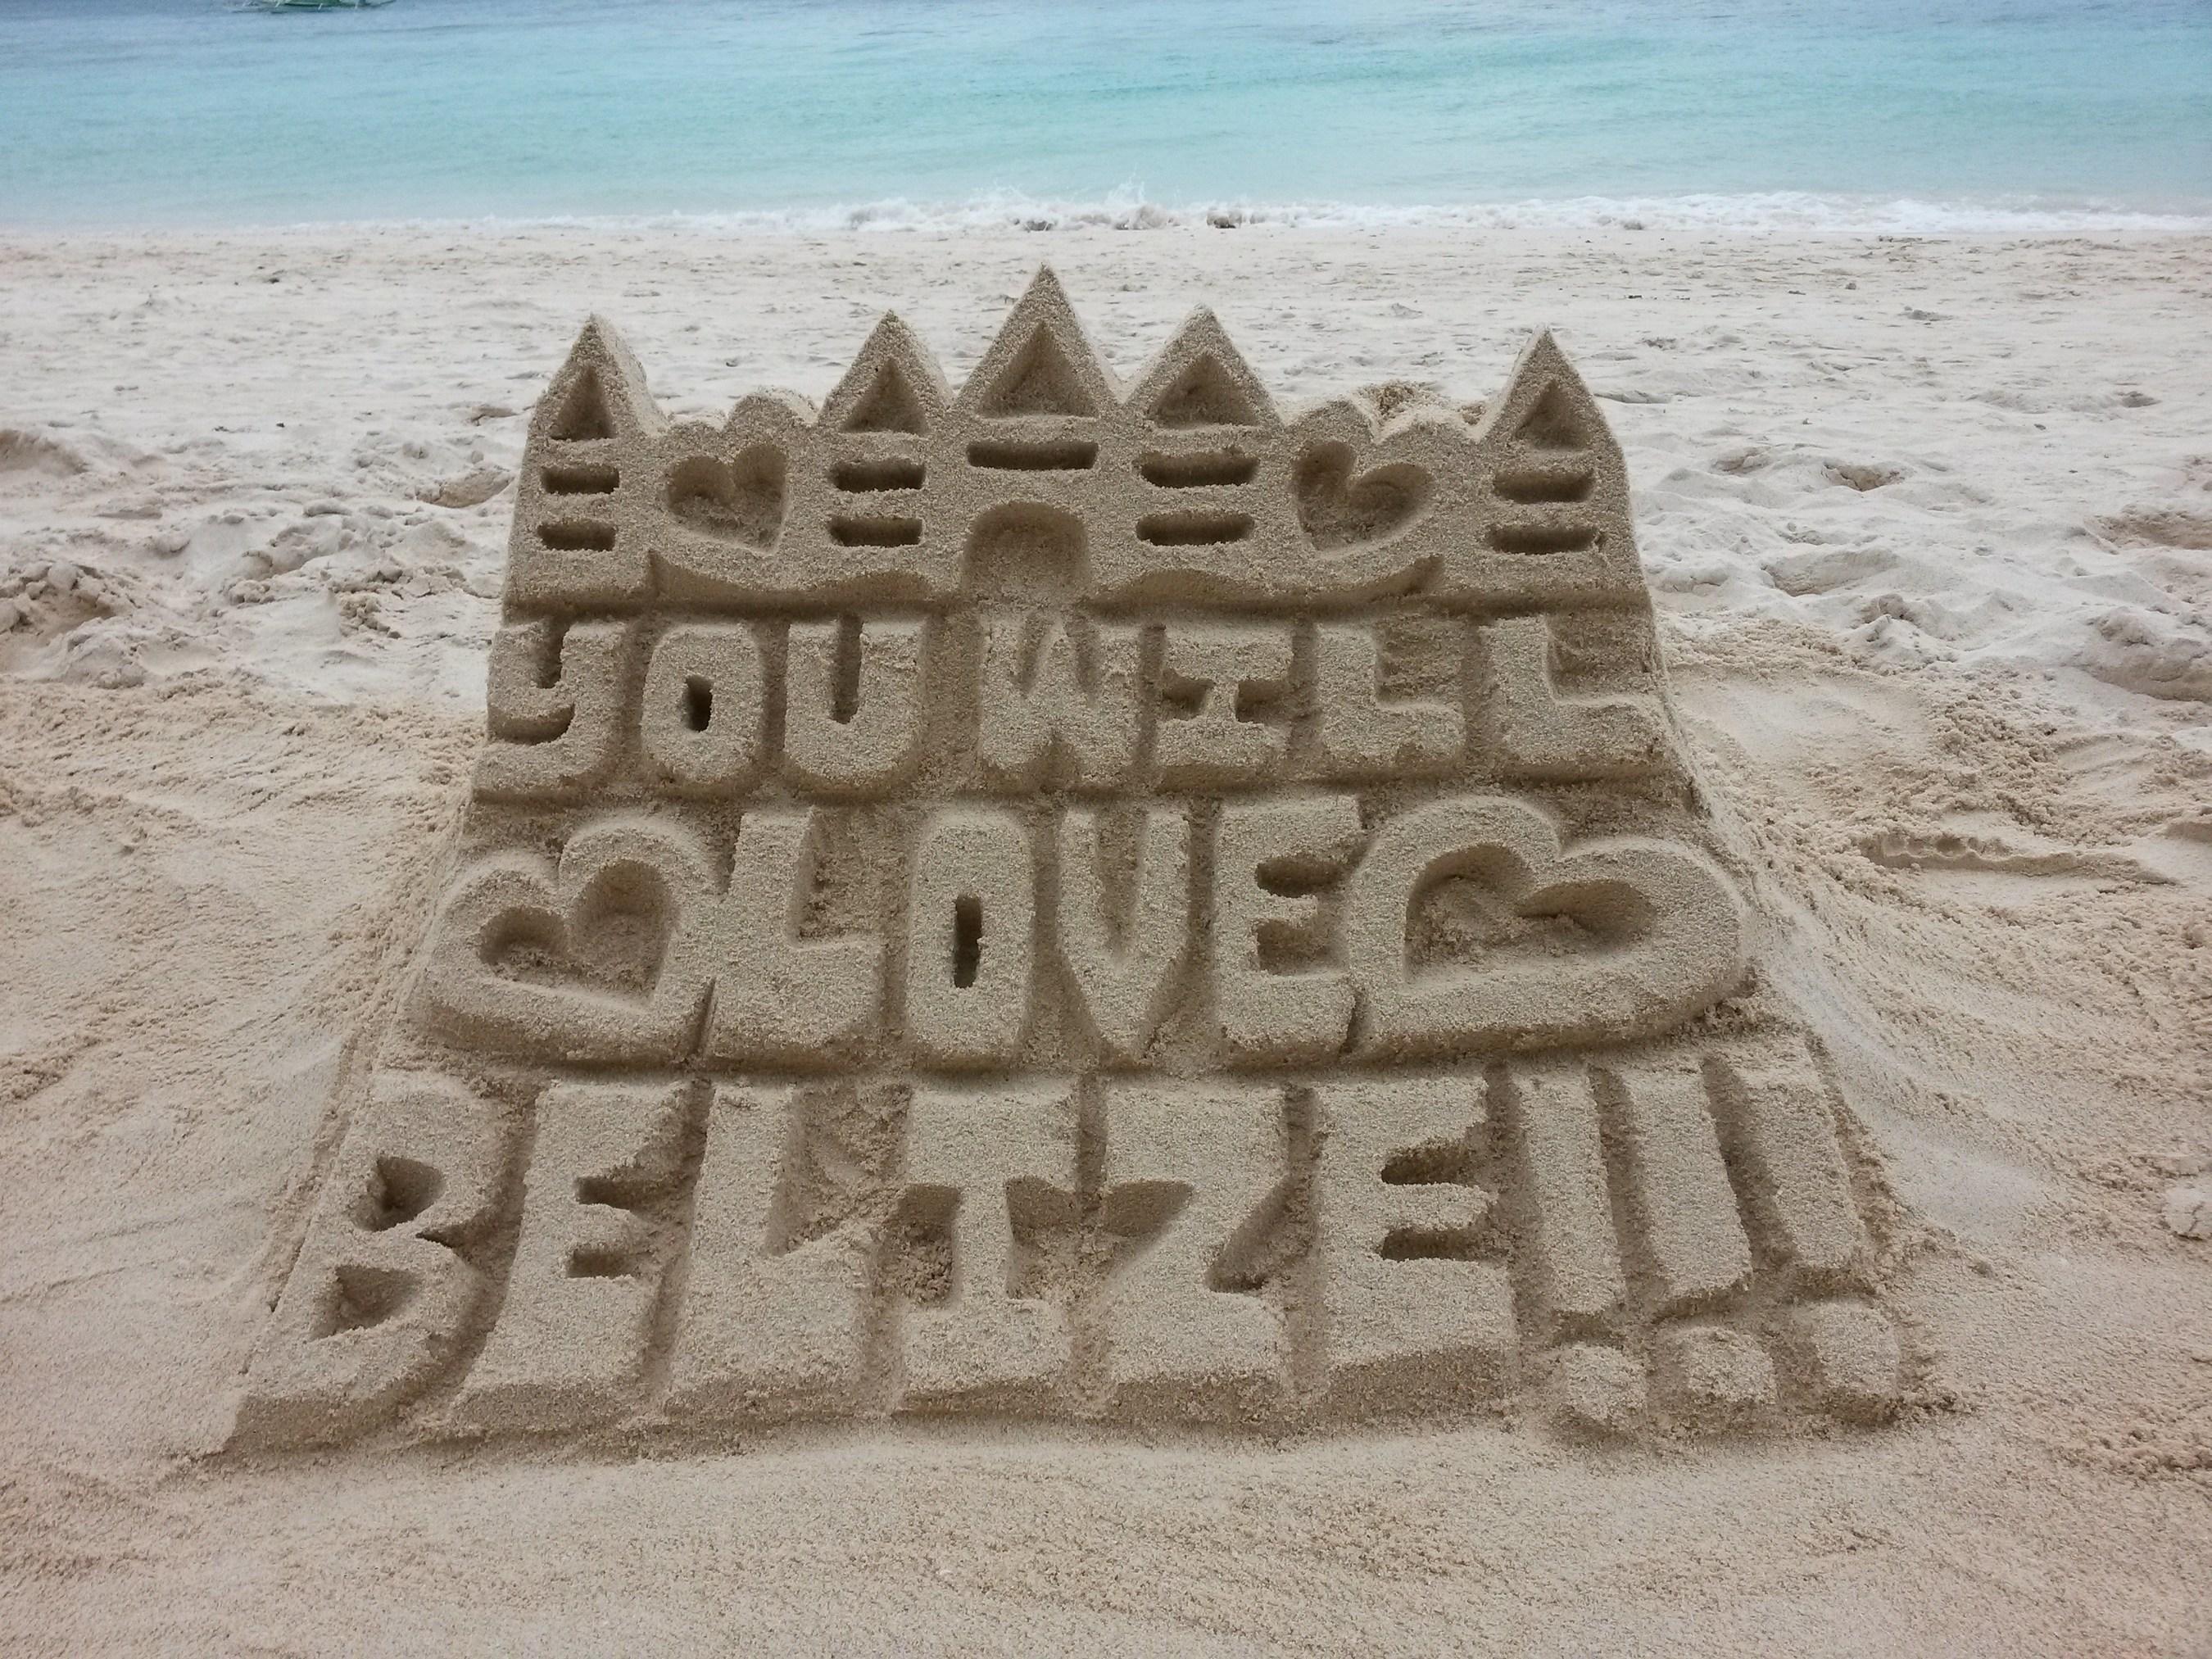 Rainforest Realty Raises Profile of Belize With Belize Talk Radio; Joins Keller Williams Worldwide